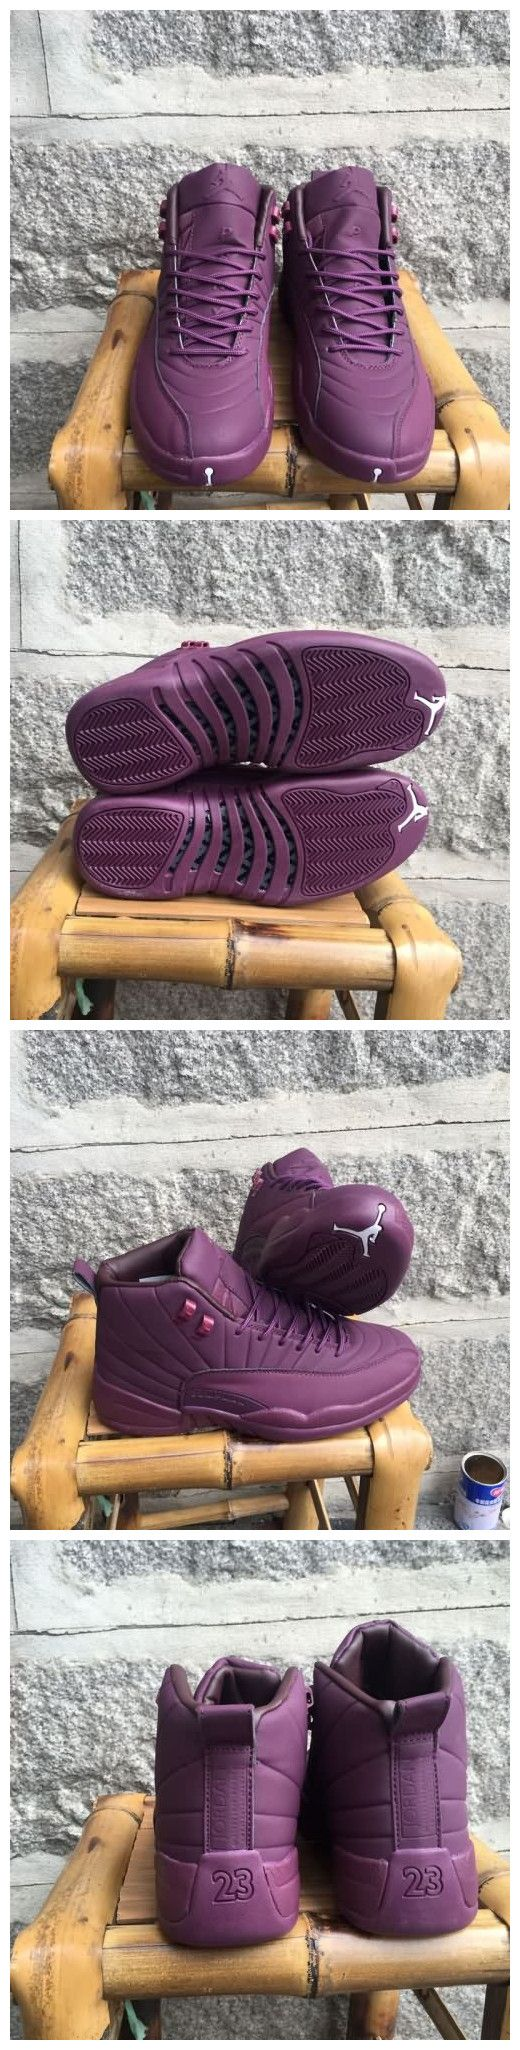 PSNY Air Jordan 12 A Mens shoes Free Shipping WhatsApp:86 13328373859